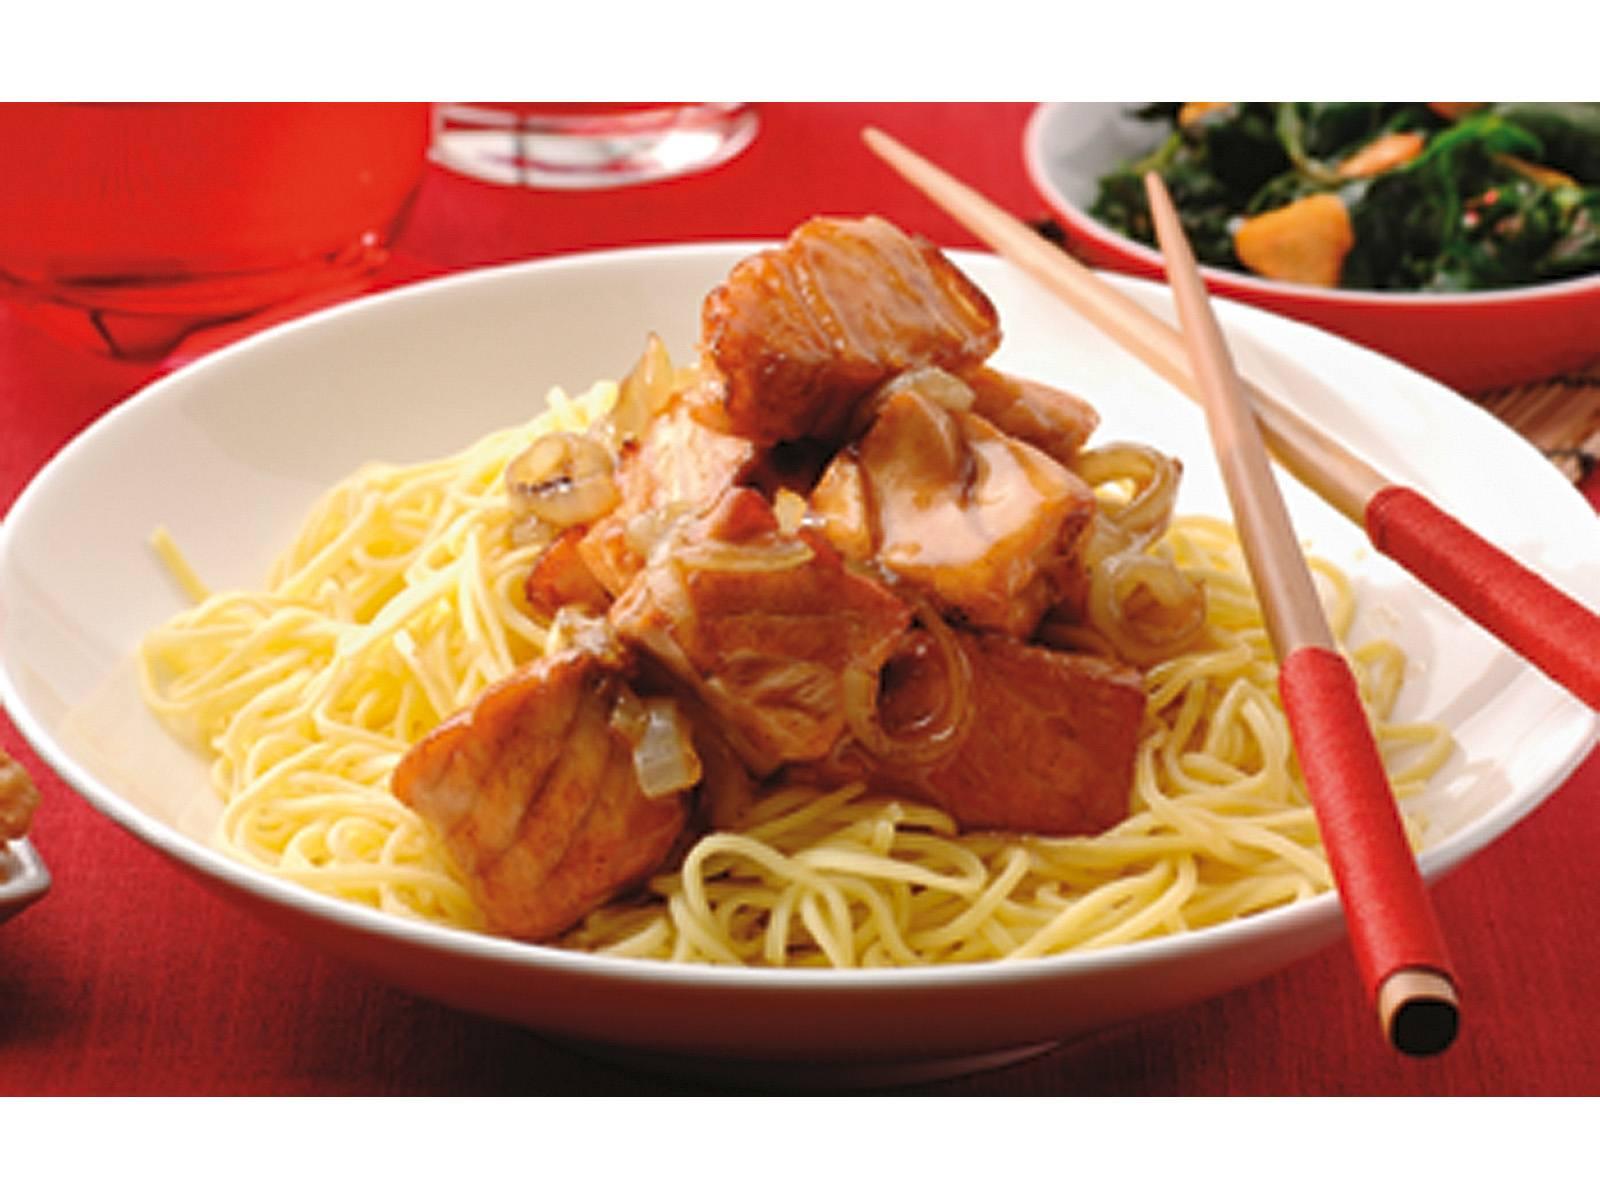 Five Spice zalm met gewokte knoflookspinazie en Chinese mie